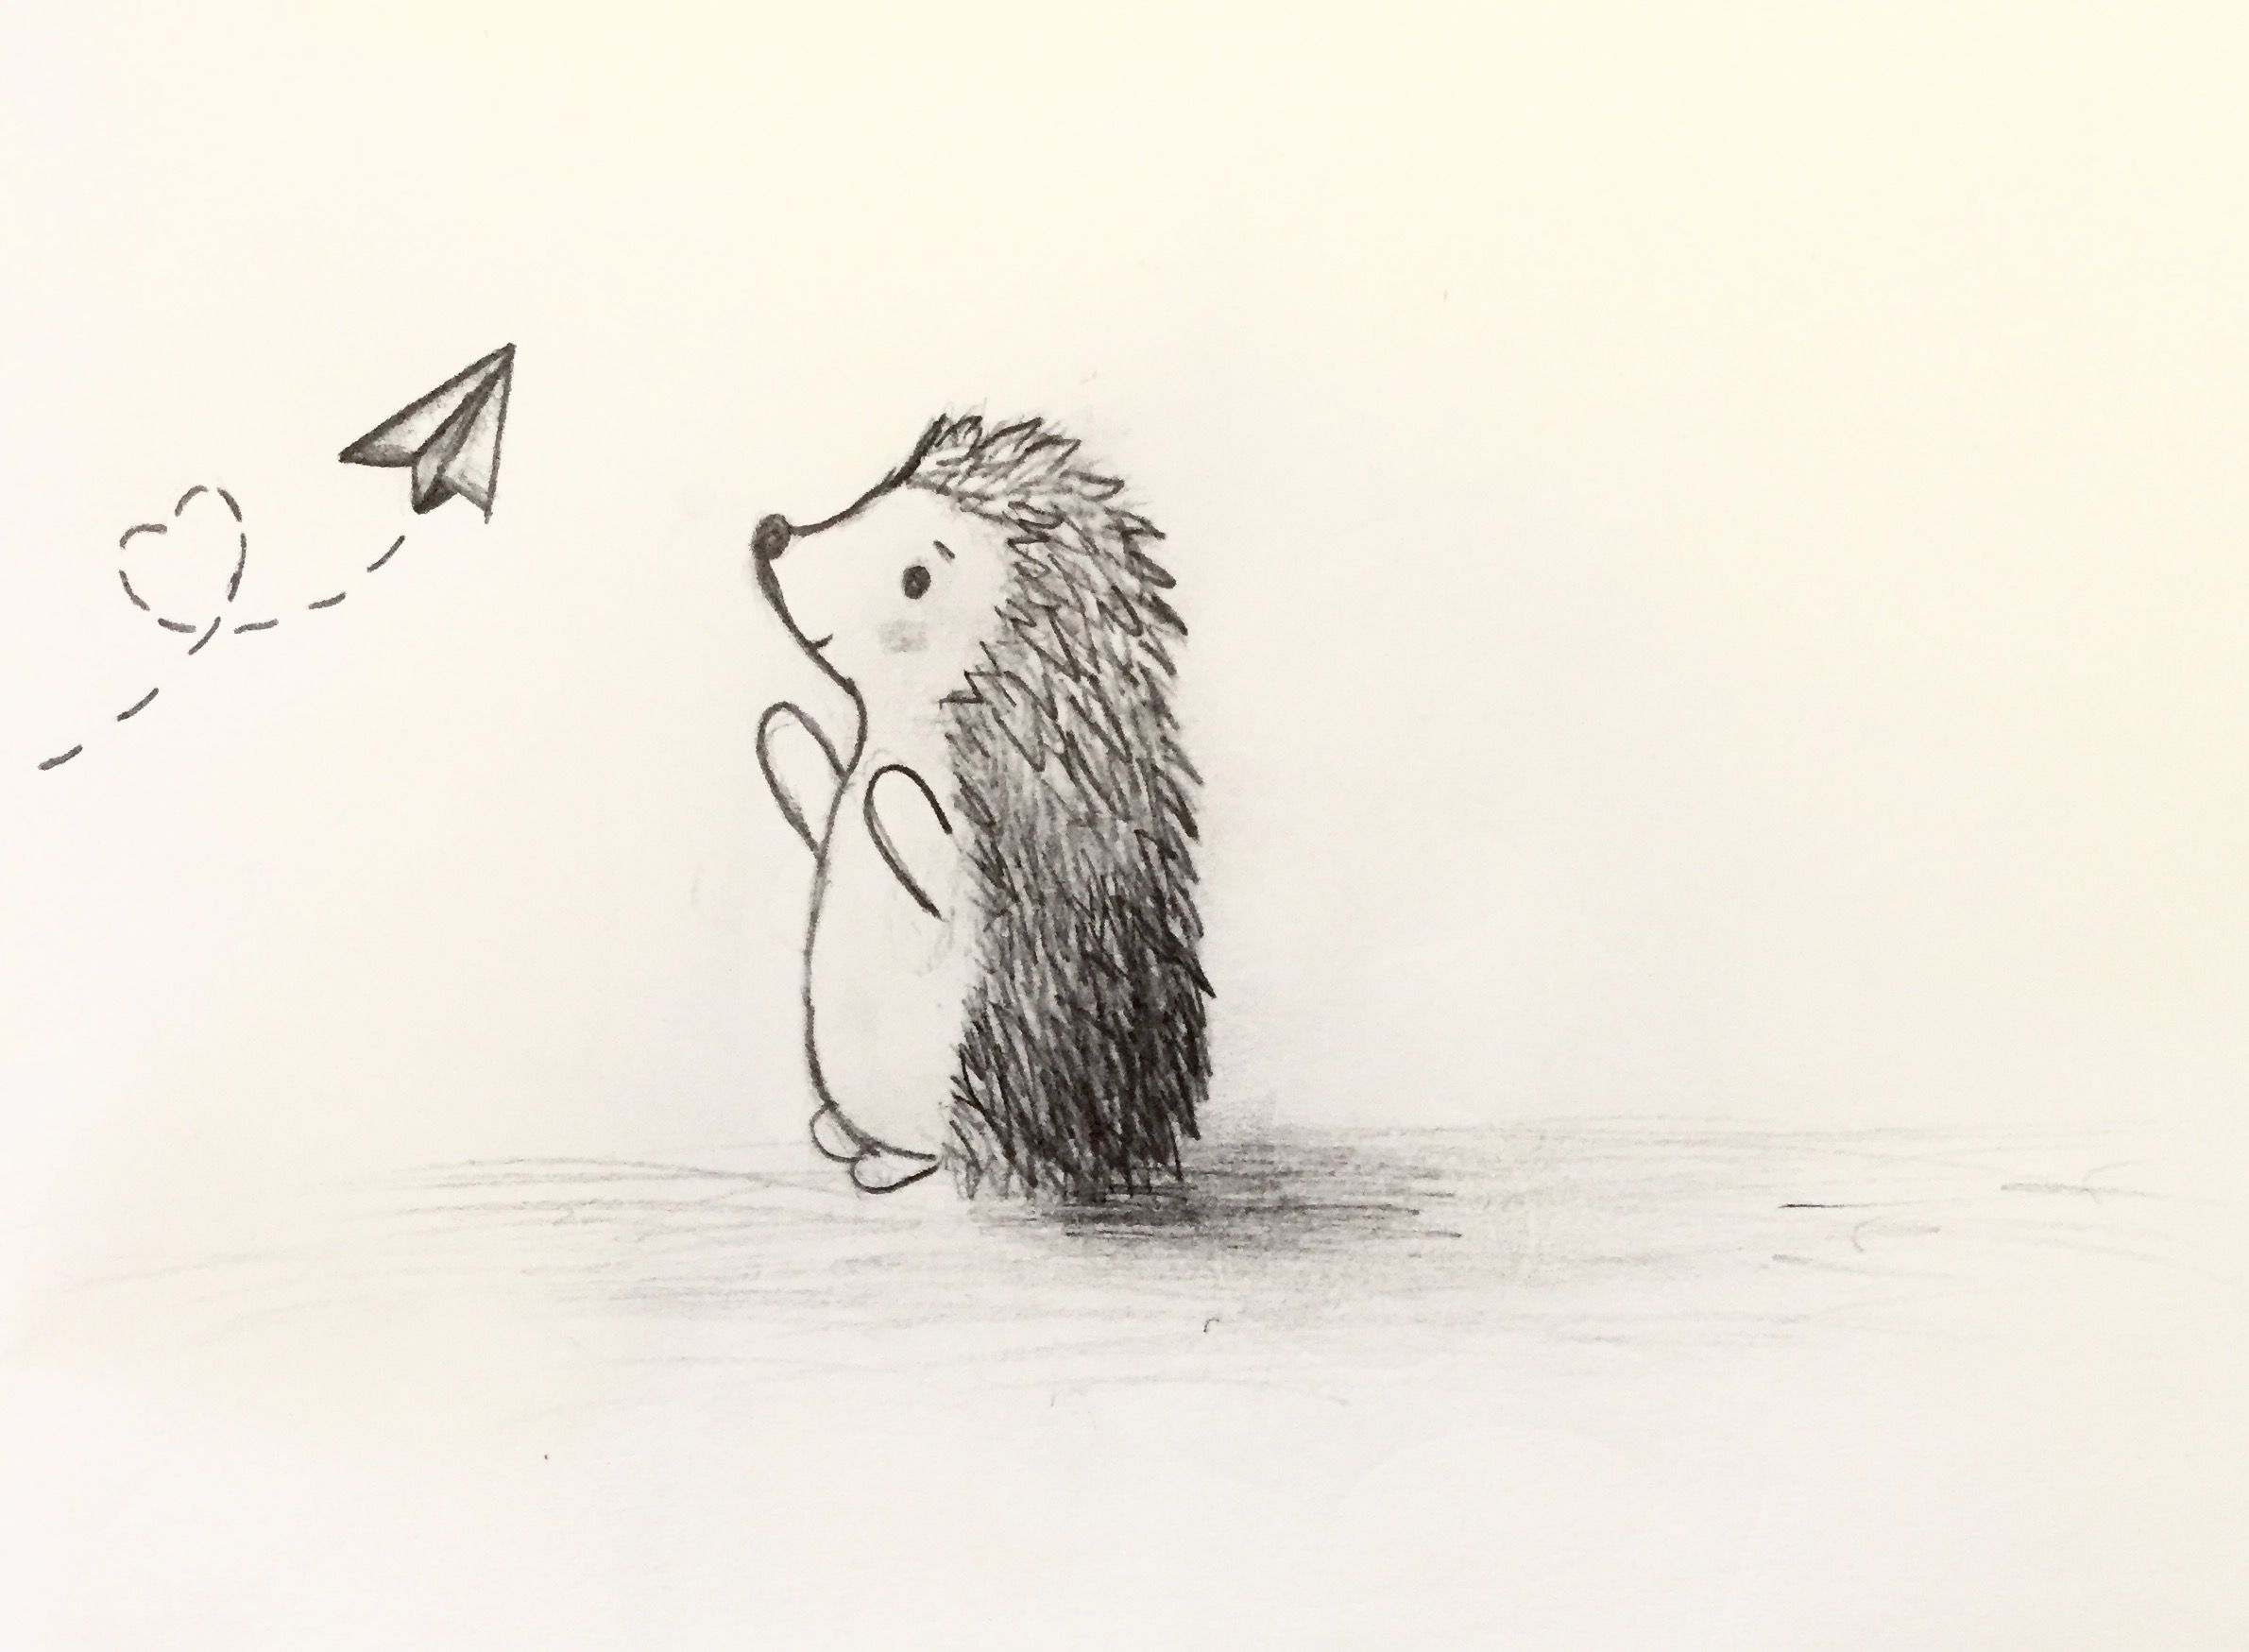 Line Drawing Hedgehog : Cute hedgehog drawing at getdrawings free for personal use